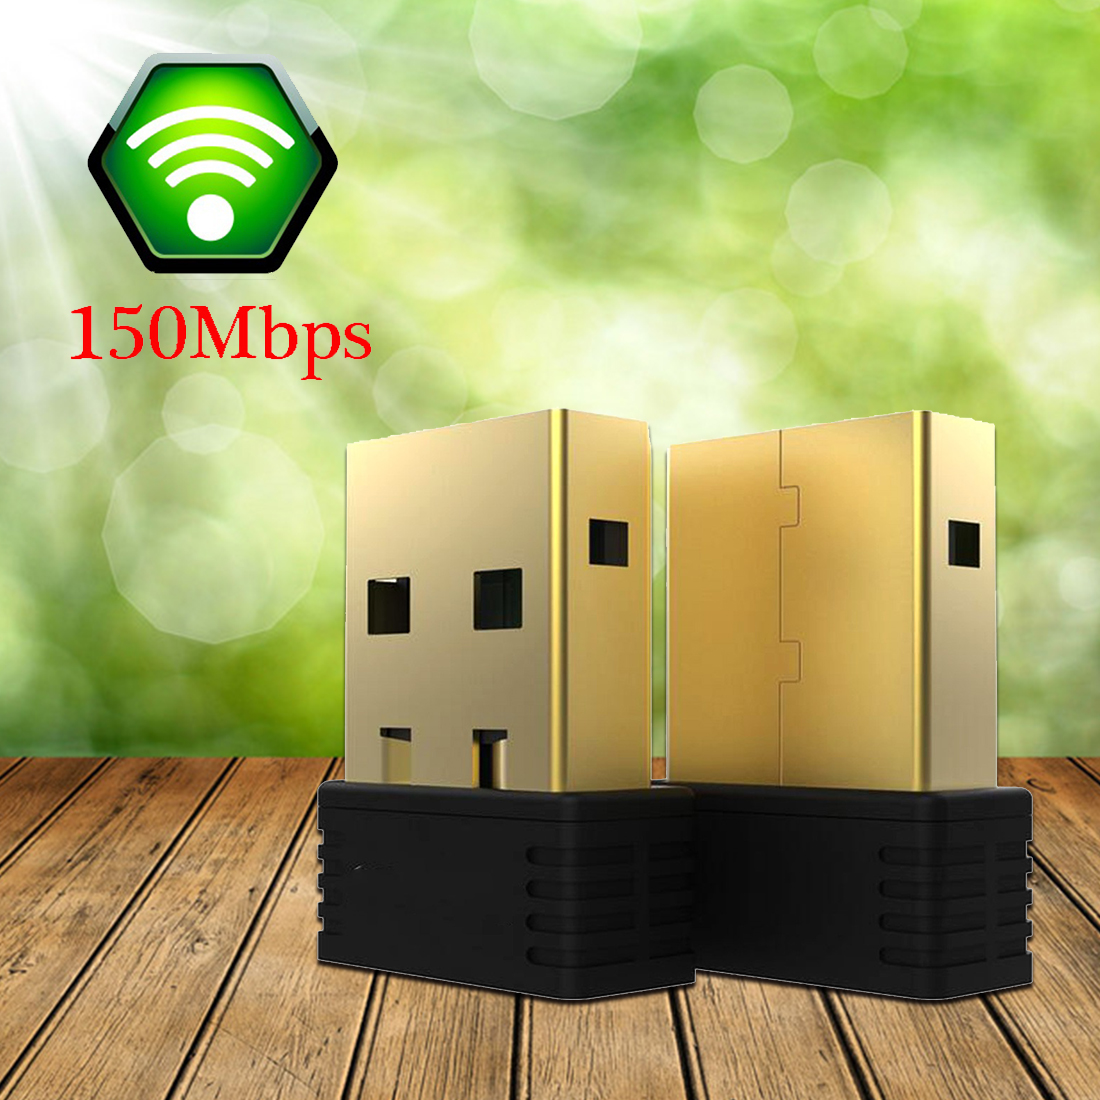 NOYOKERE 150Mbps Nano Ασύρματο USB προσαρμογέας WiFi Adaptador WiFi κάρτα δικτύου Dongle 802.11n / g / b LAN